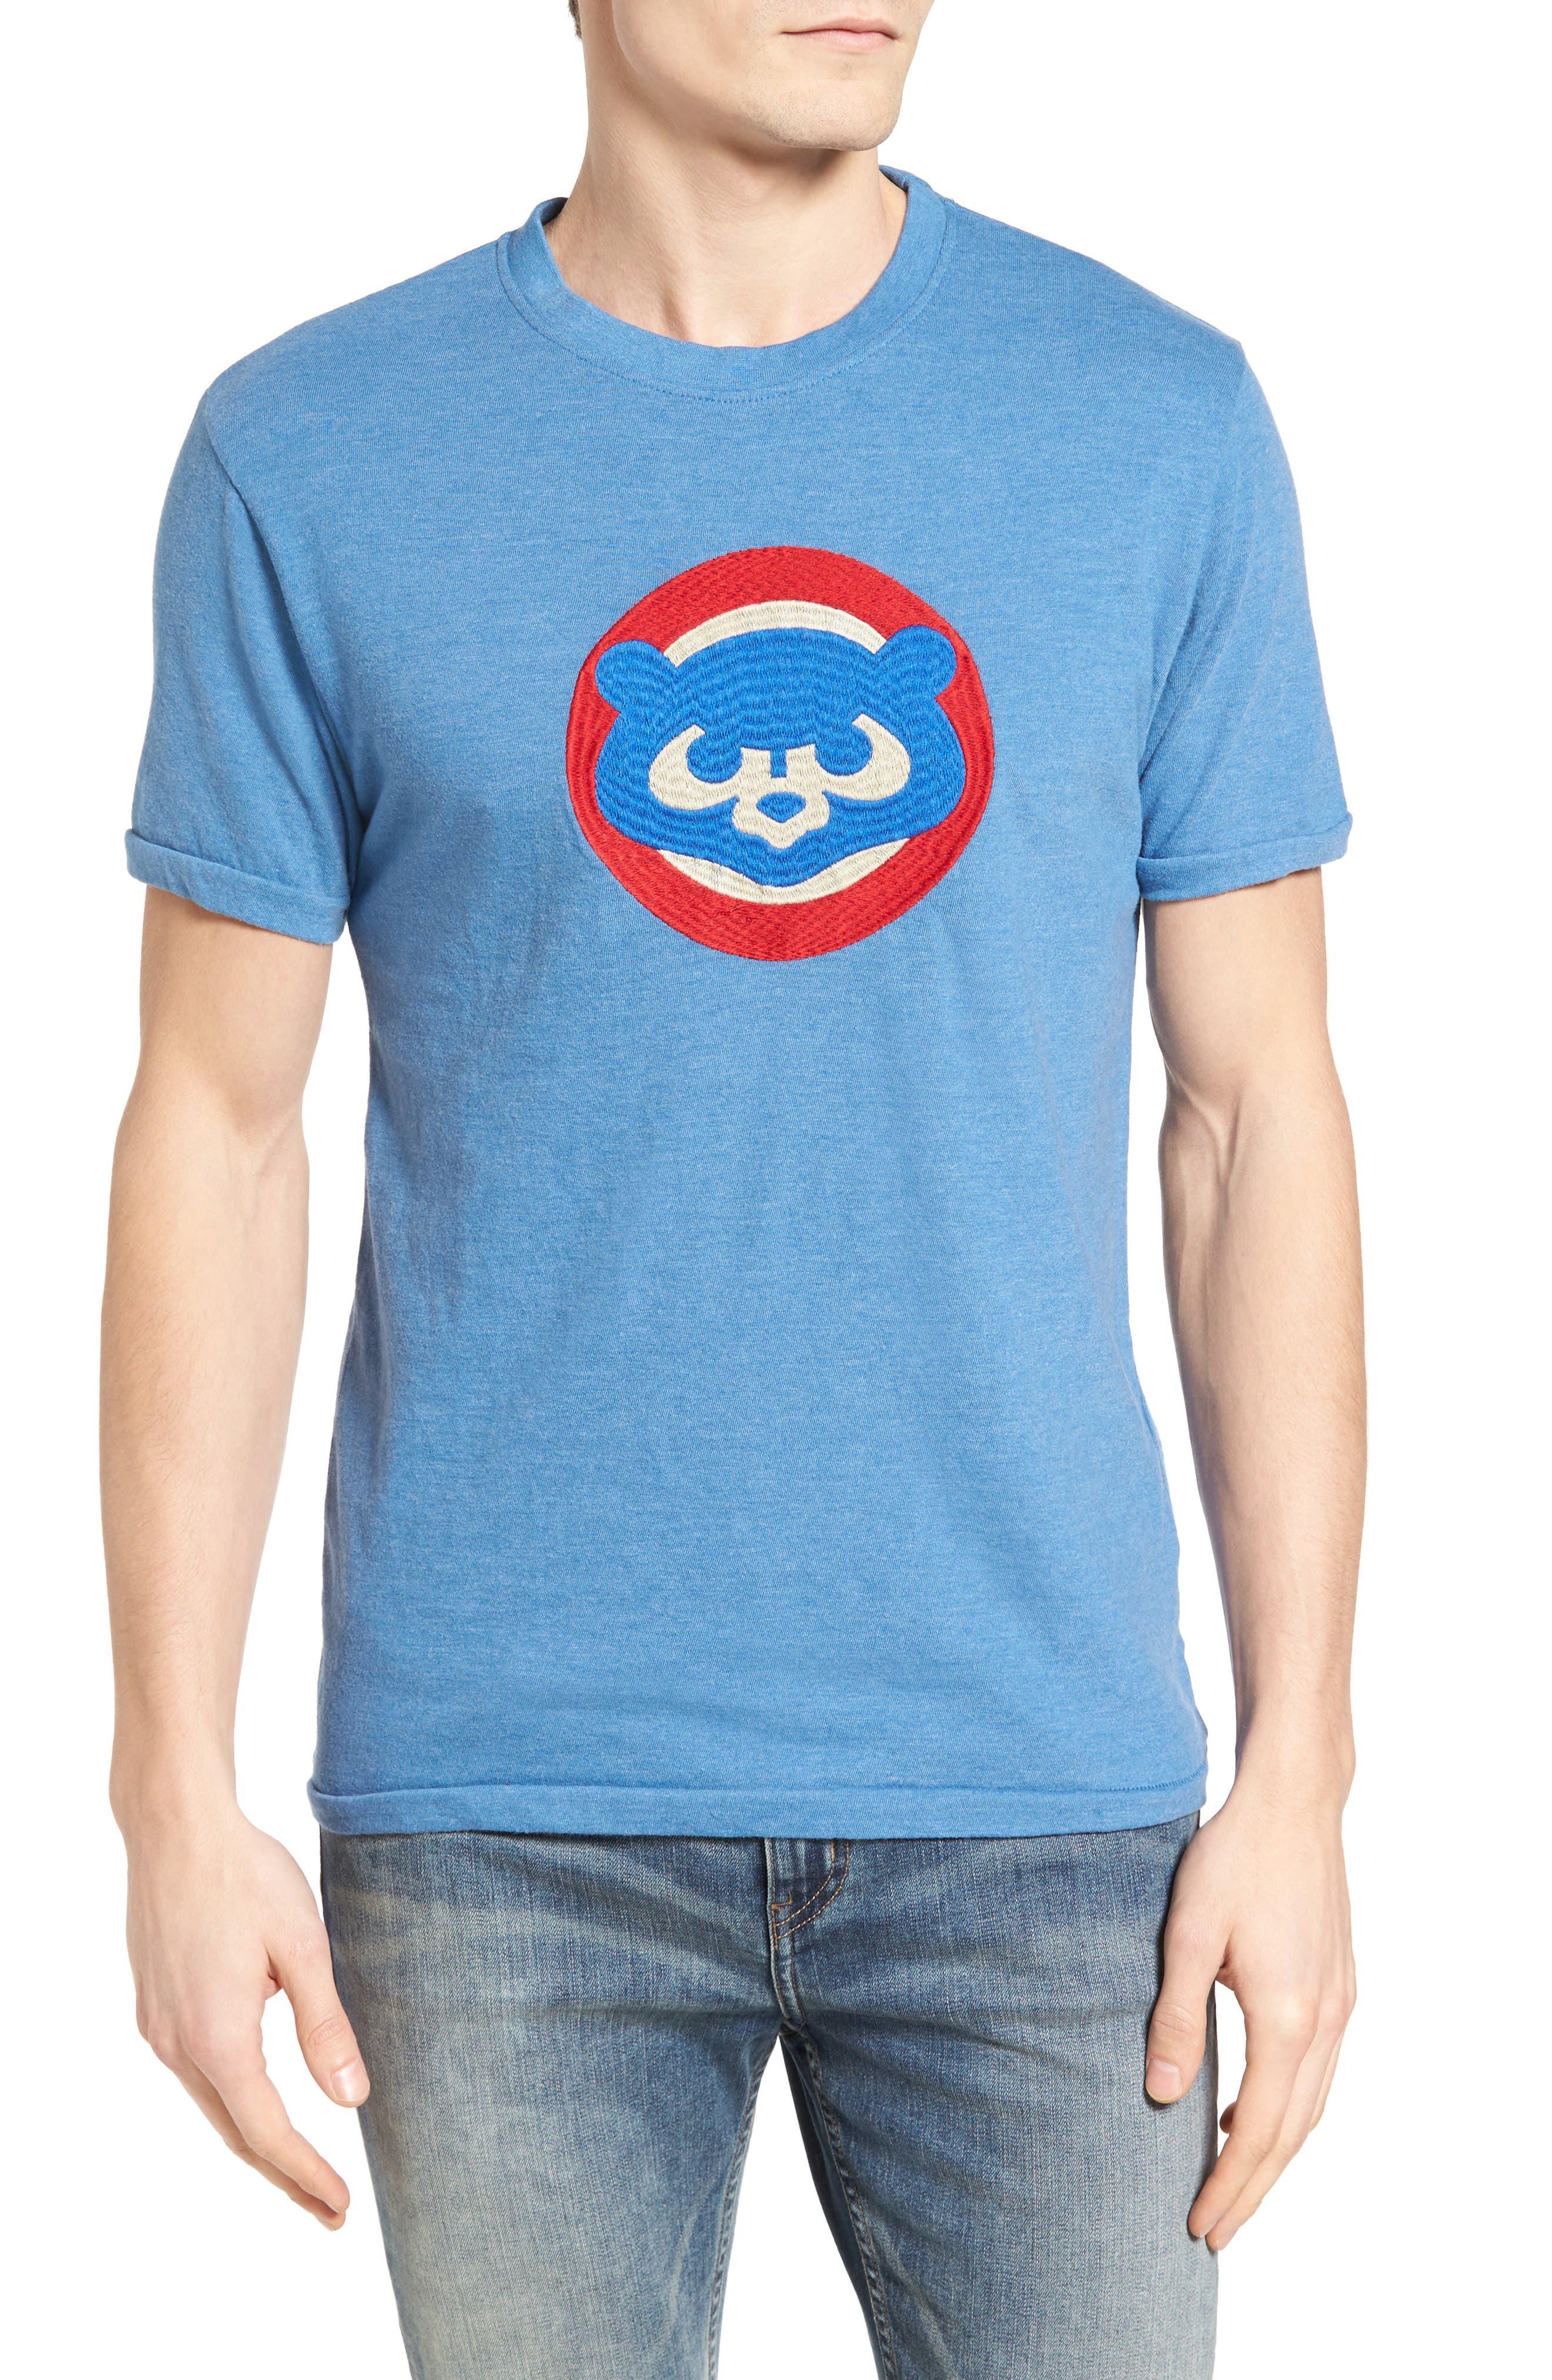 Hillwood Chicago Cubs T-Shirt,                             Main thumbnail 1, color,                             450